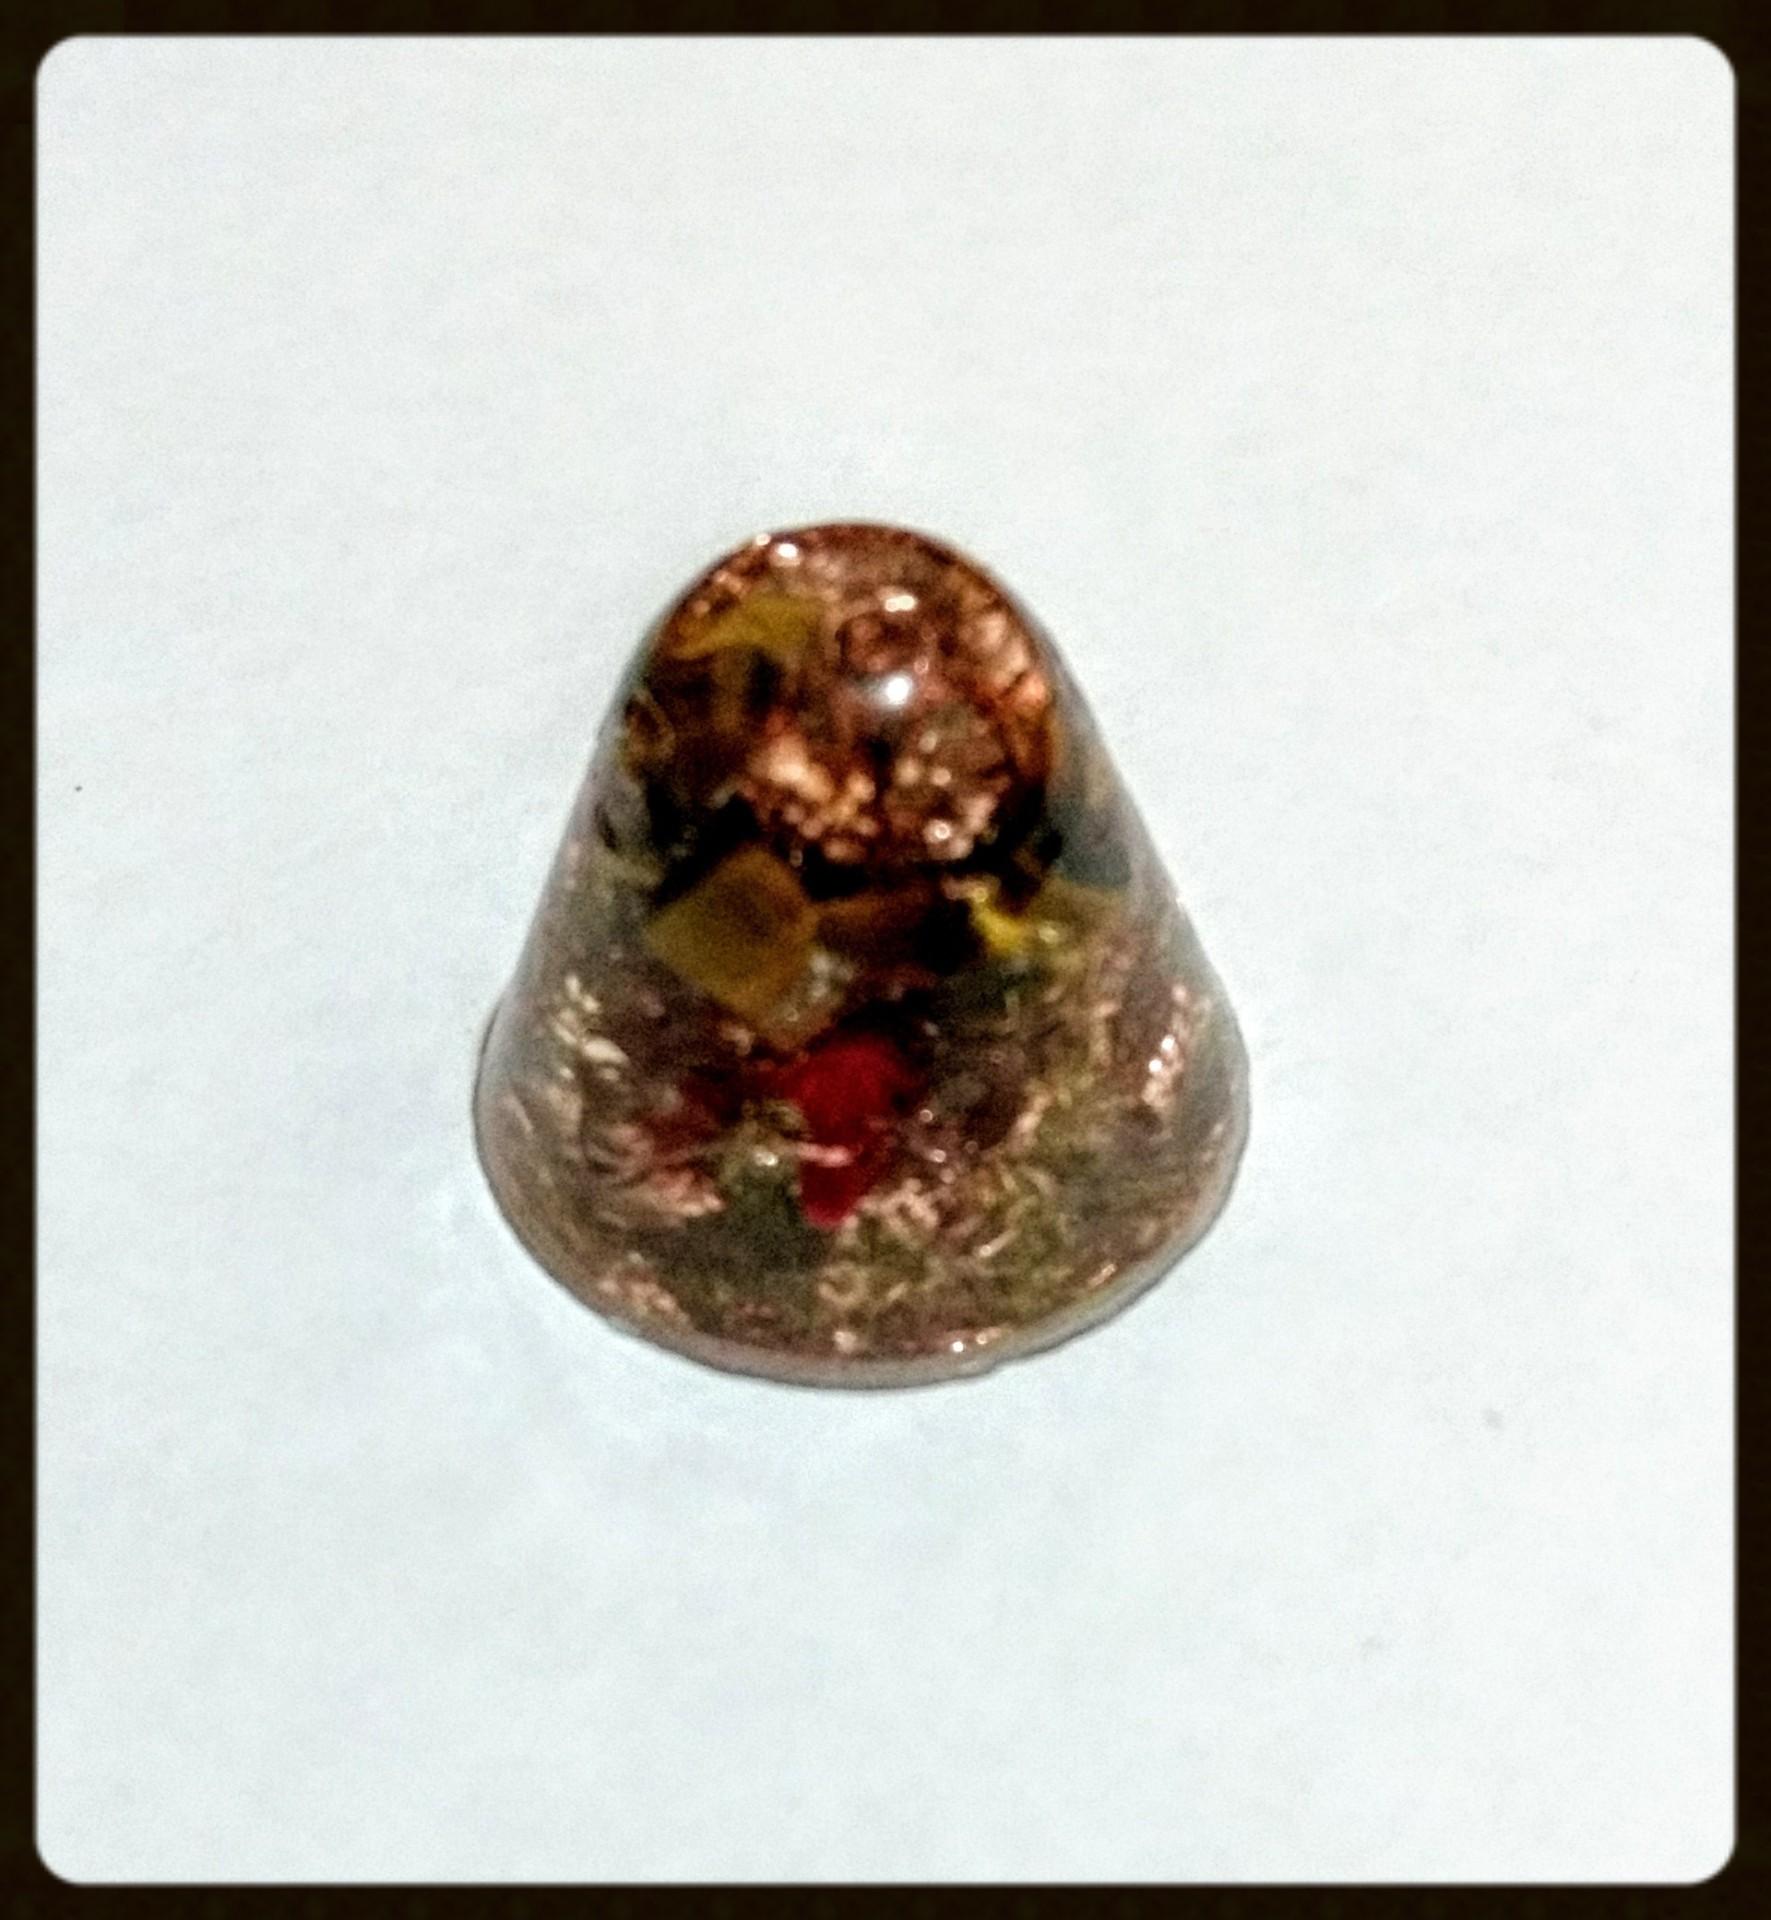 Piramides con punta redondeada mini, ojo de tigre, coral, cobre y bronce